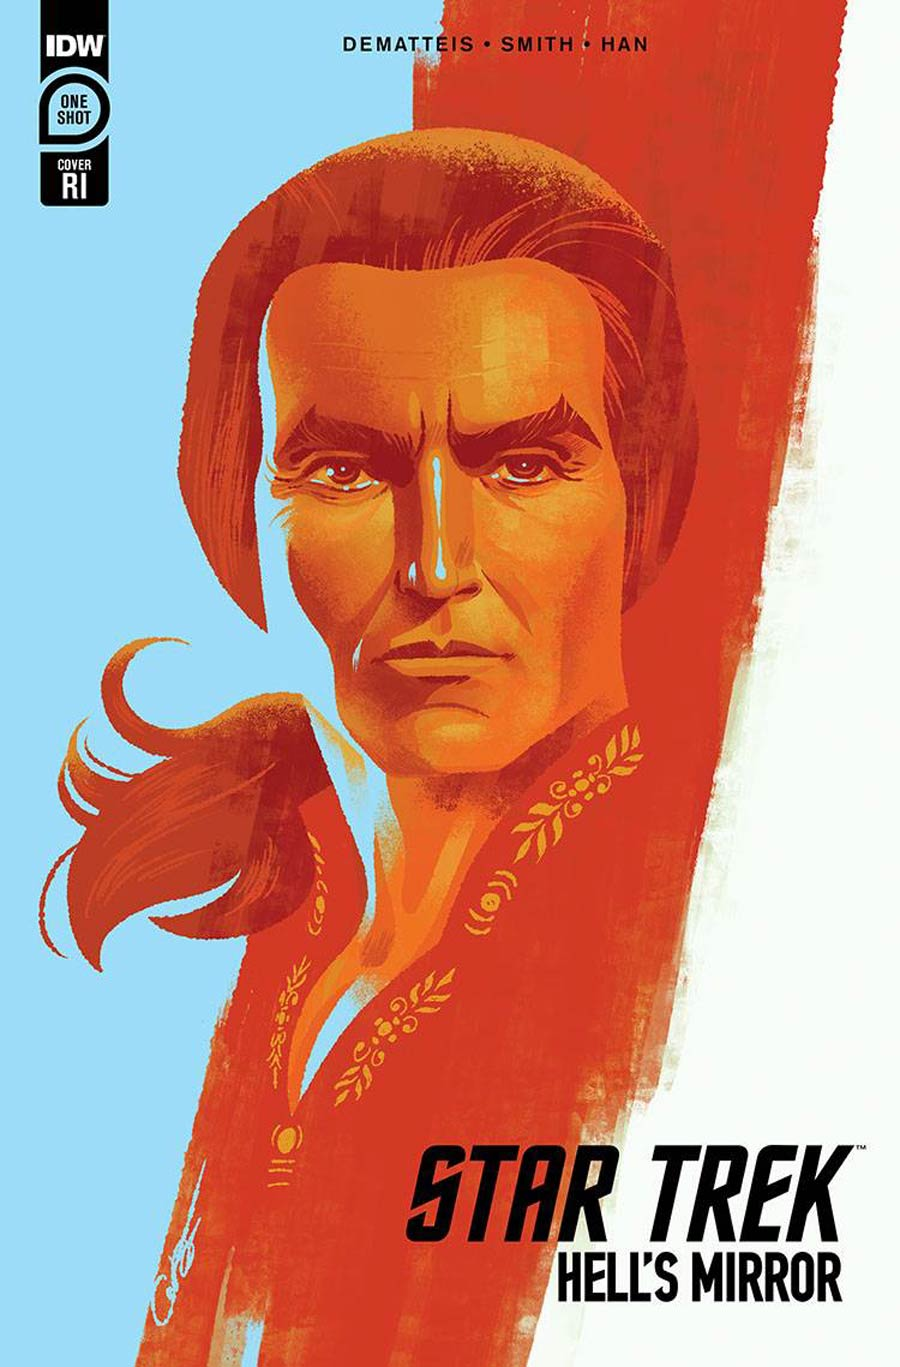 Star Trek Hells Mirror Cover B Incentive George Caltsoudas Variant Cover